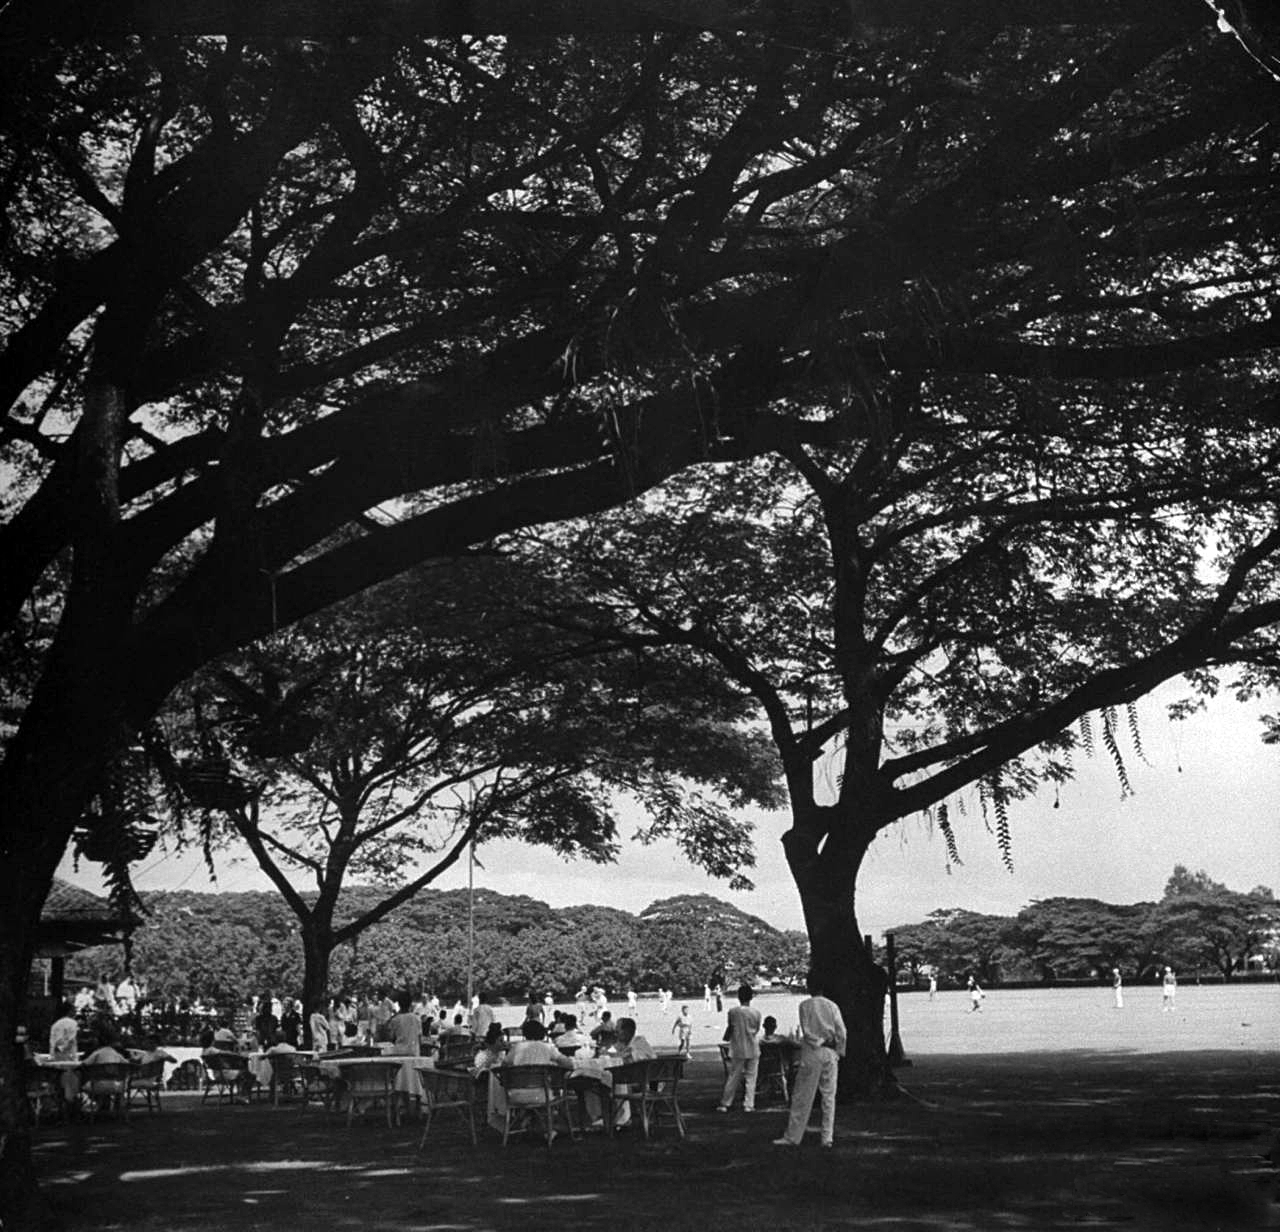 Baseball game at the Polo Club, circa 1941